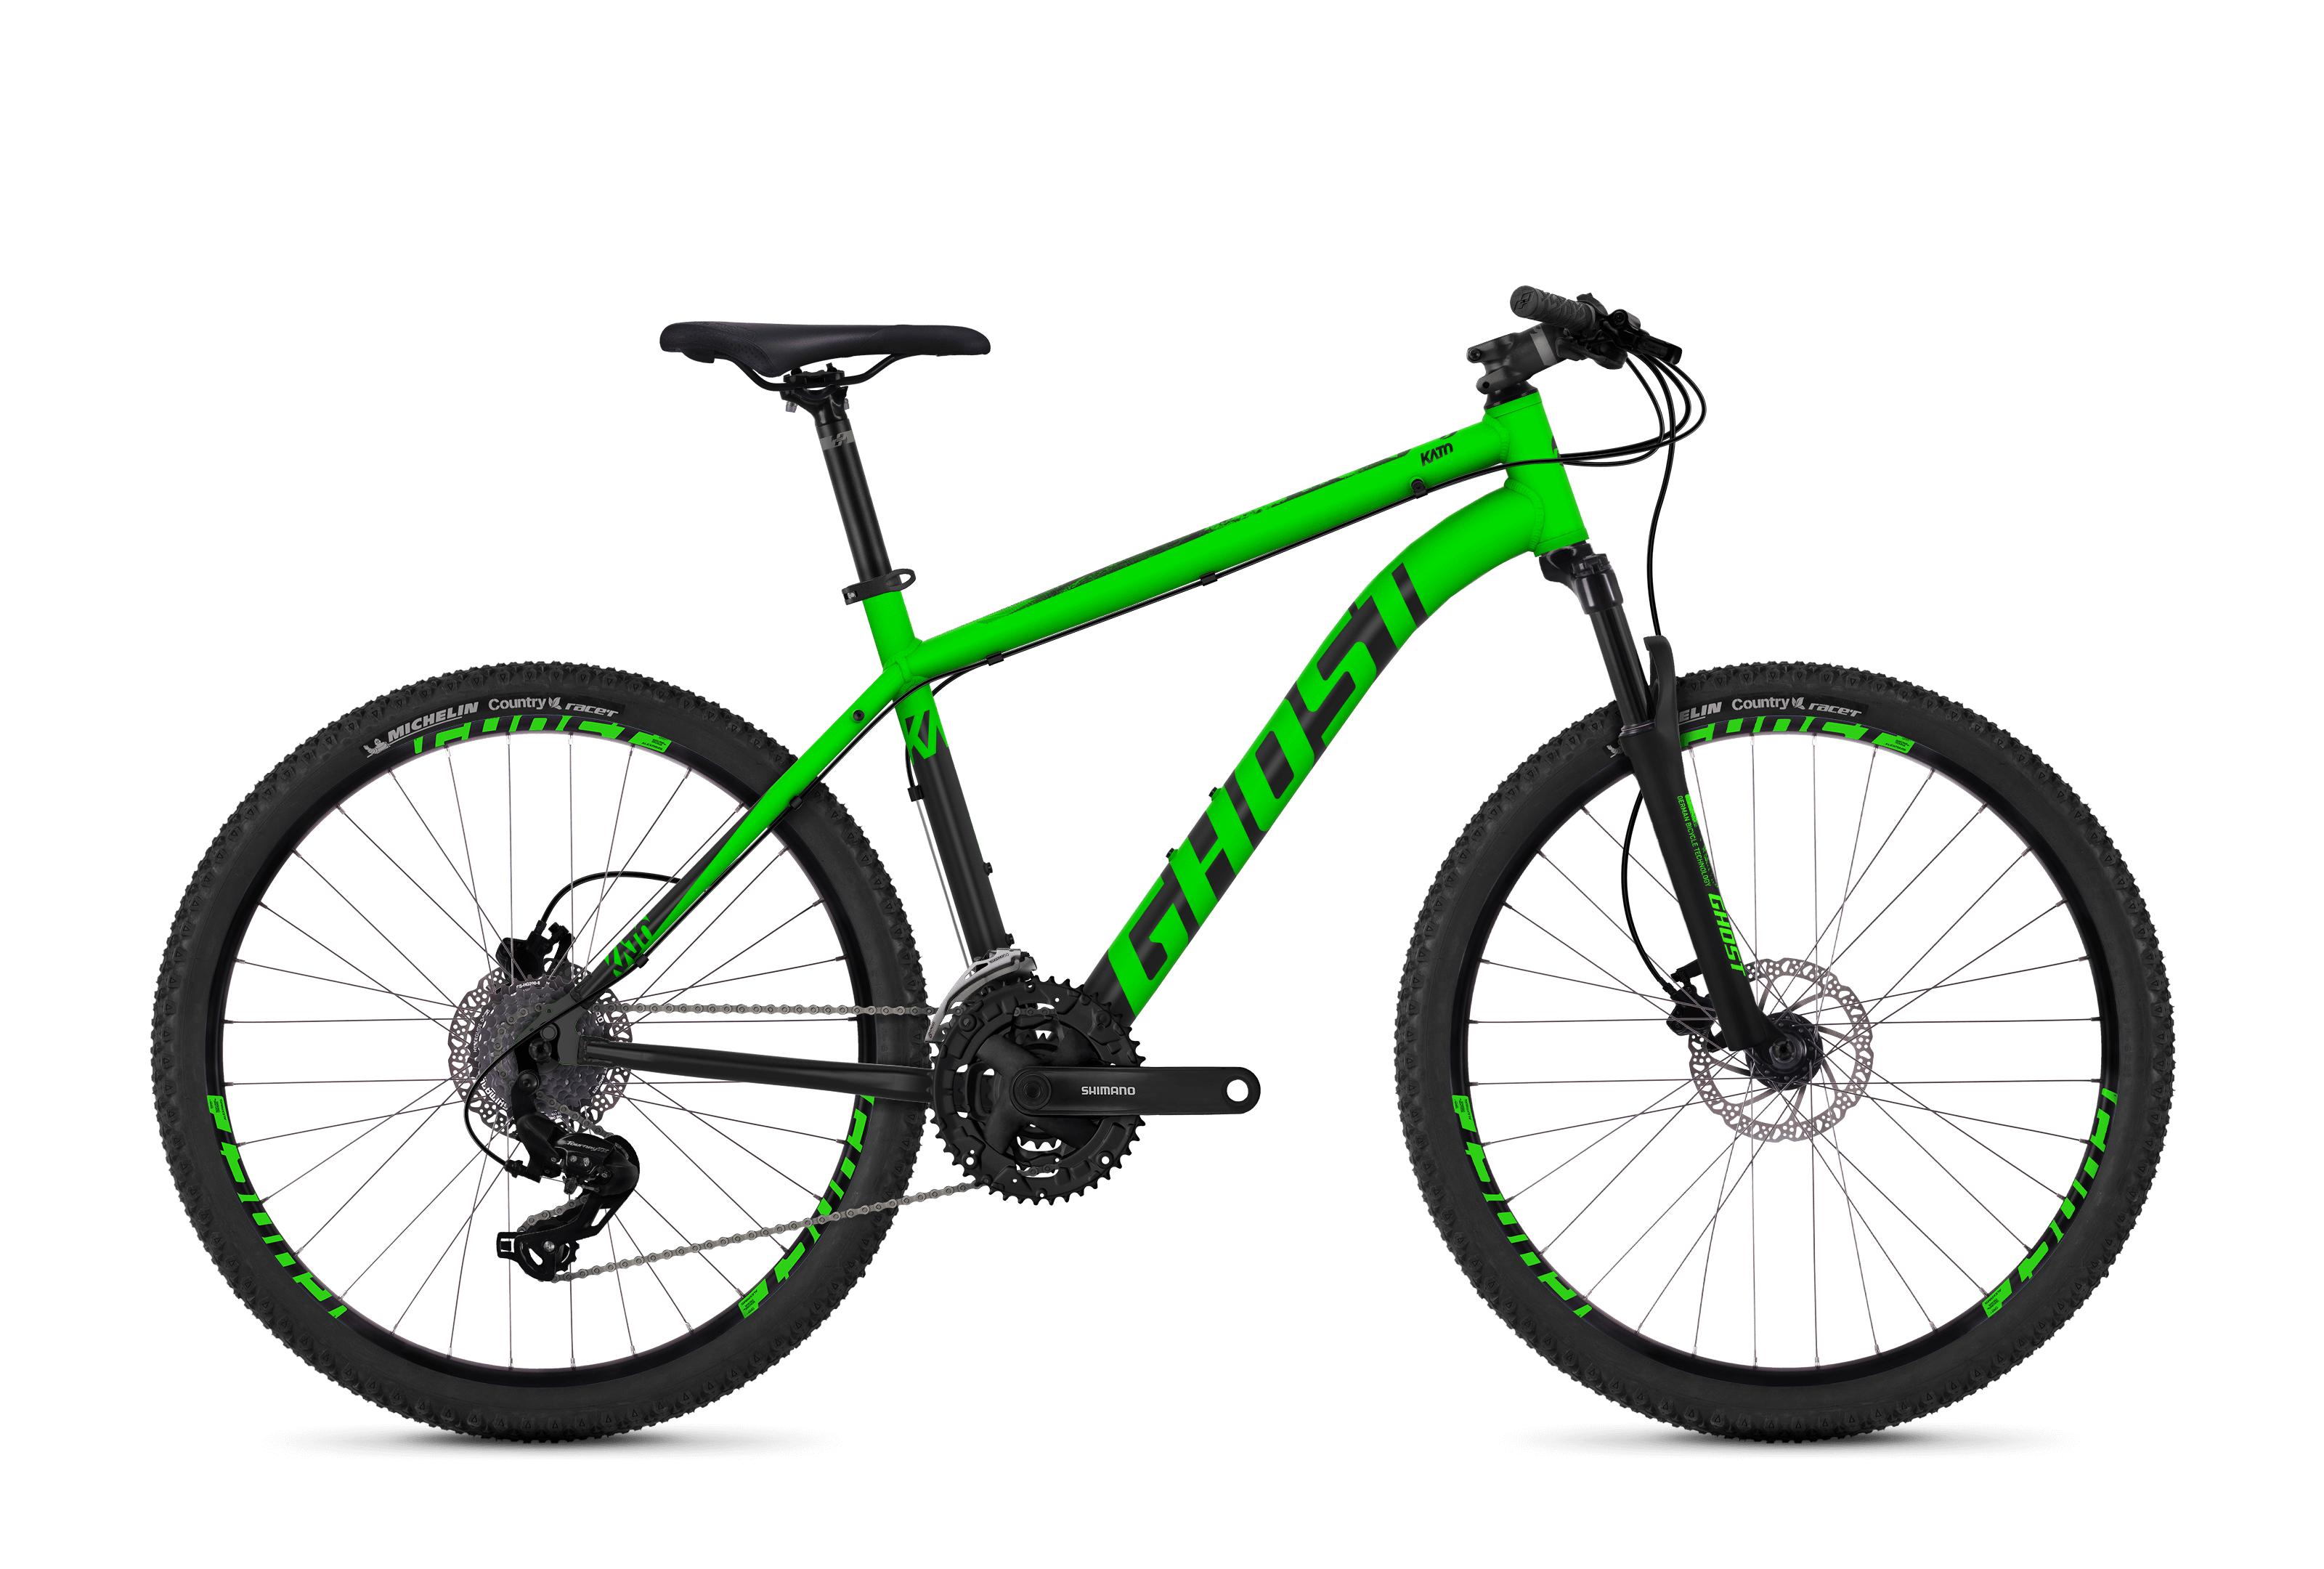 Horské kolo GHOST Kato 1.6 green / black XXS 2018